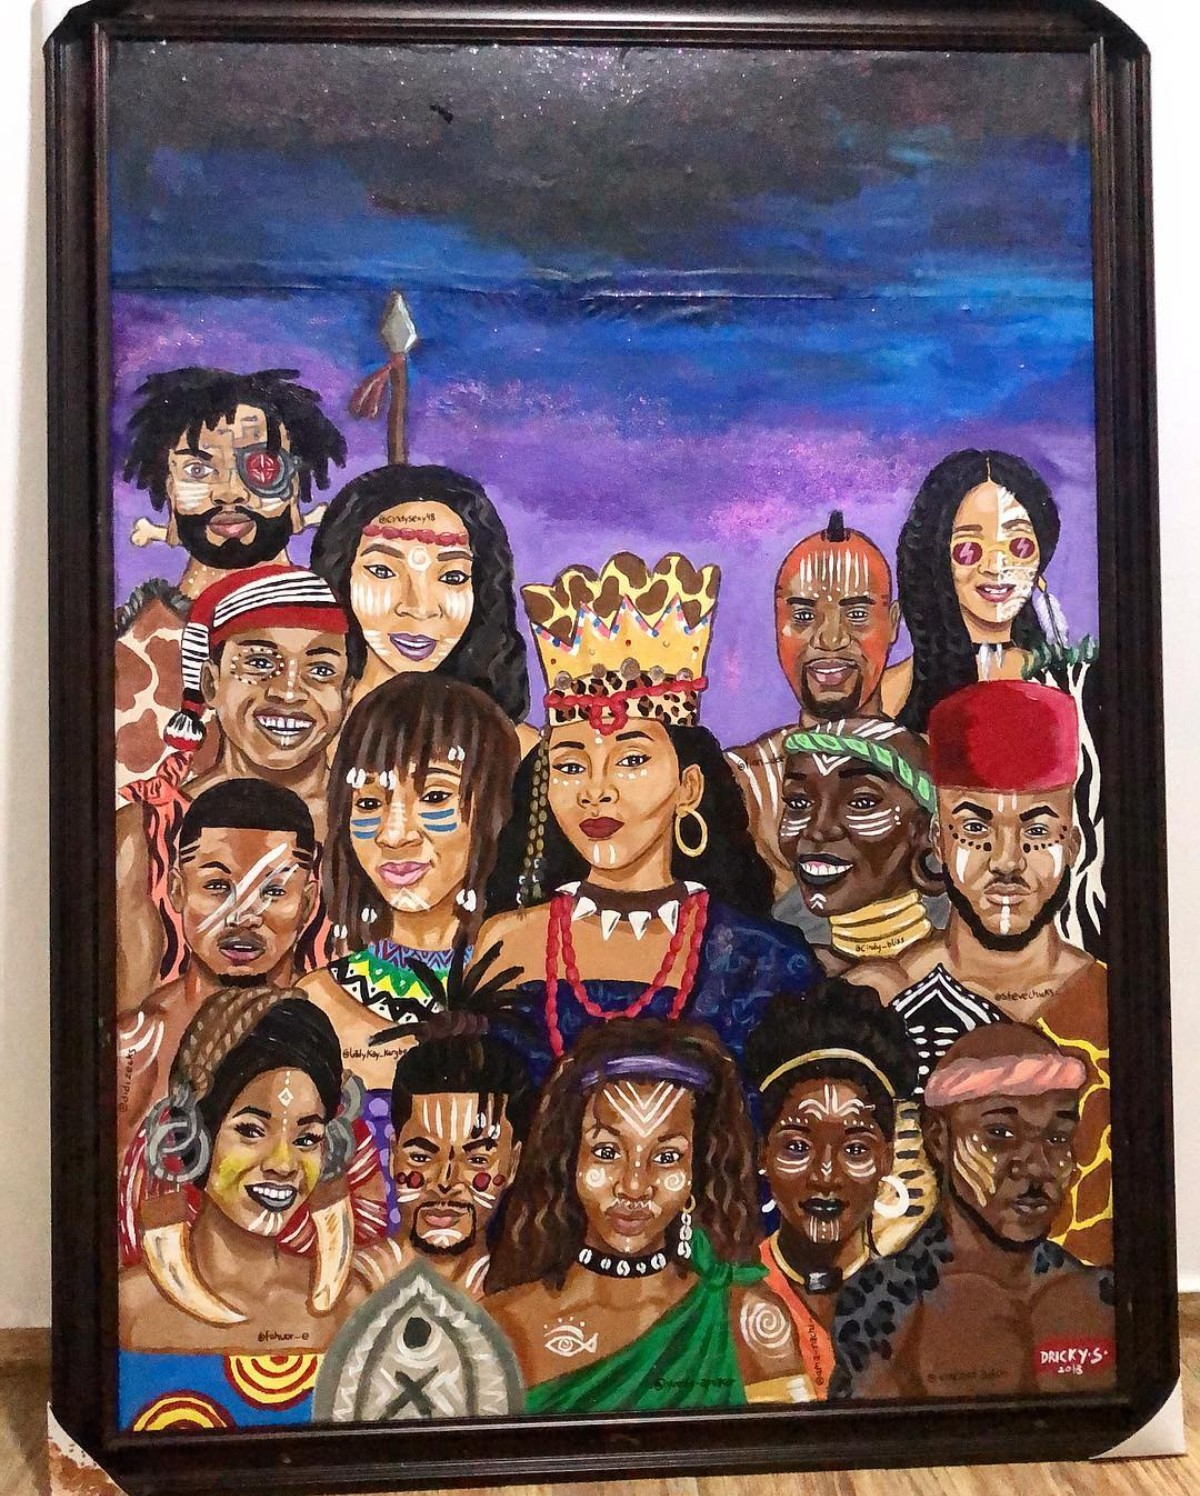 Genevieve Nnaji Painted As A Queen